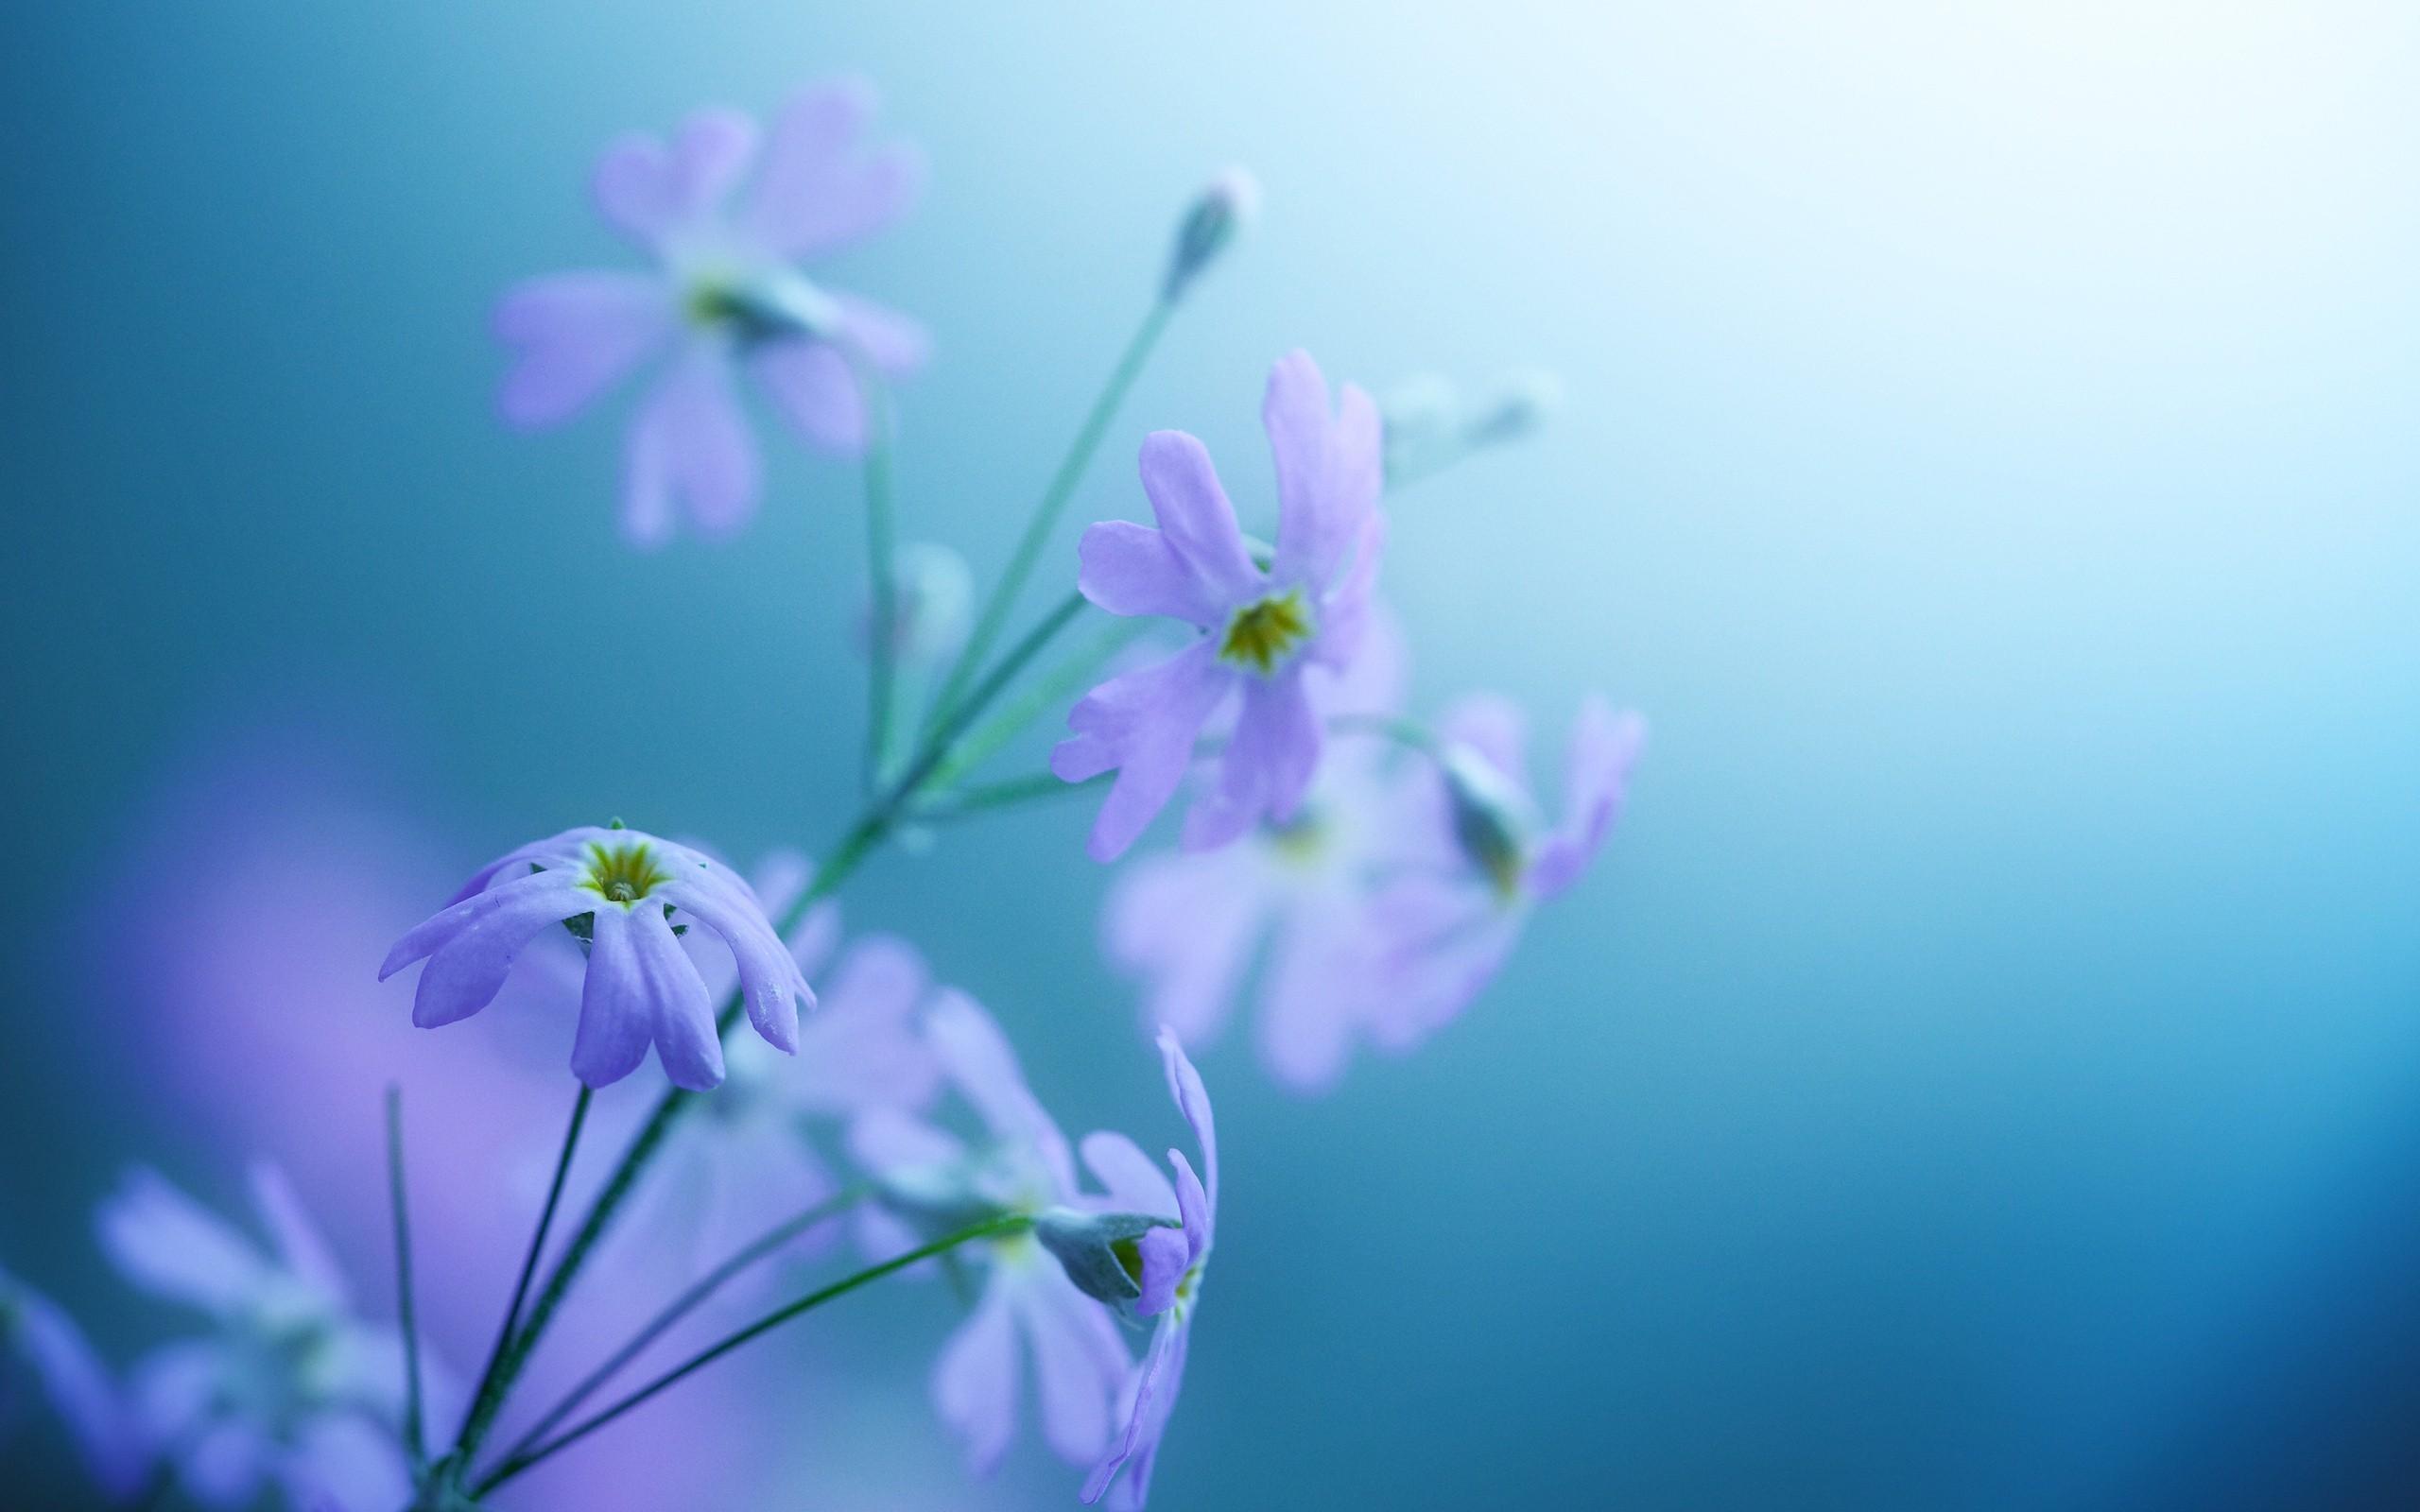 Natural Flowers Desktop Hd Wallpapers 8938 Wallpaper 2560x1600